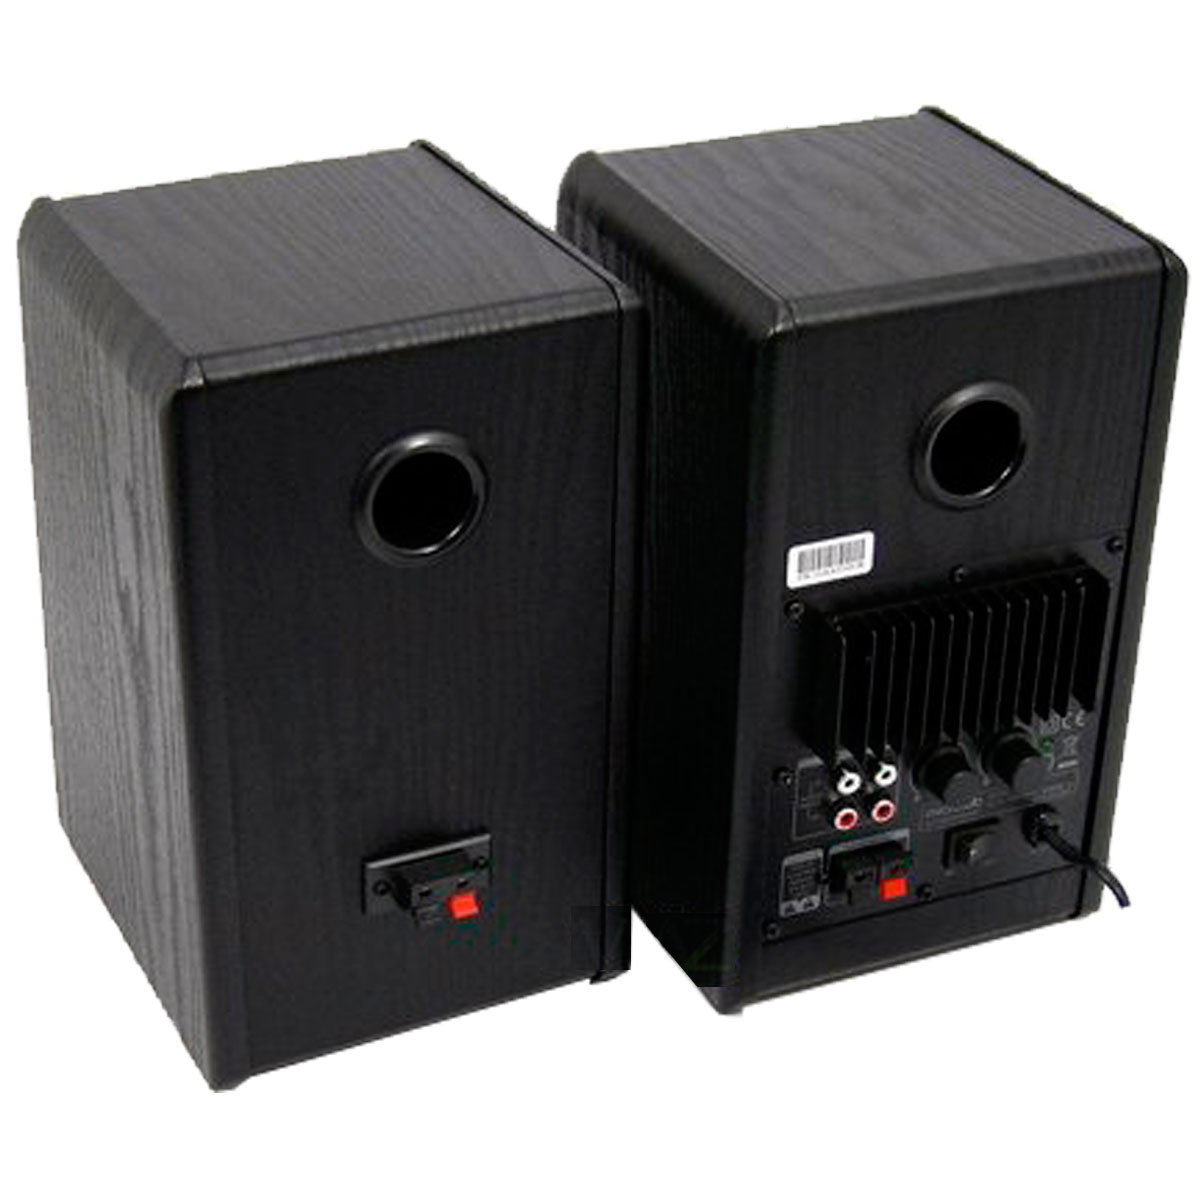 Monitor de Referência Ativo Fal 4 Pol 48W (Par) - B 77 Microlab